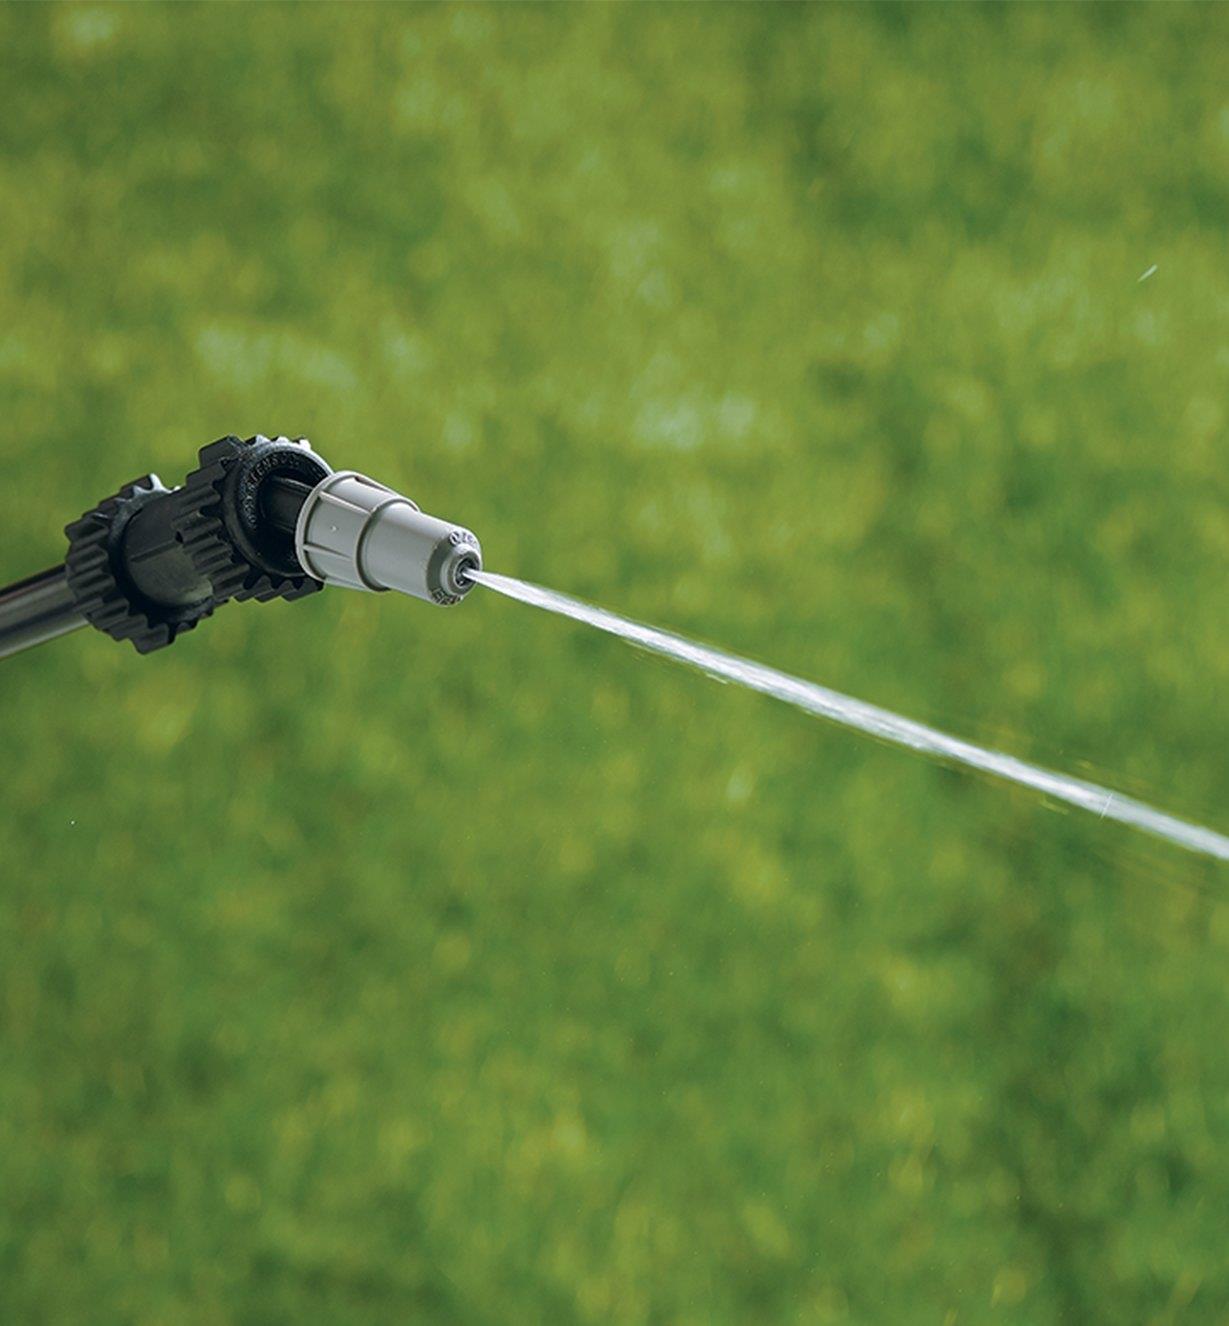 Garden Sprayer wand using the jet setting